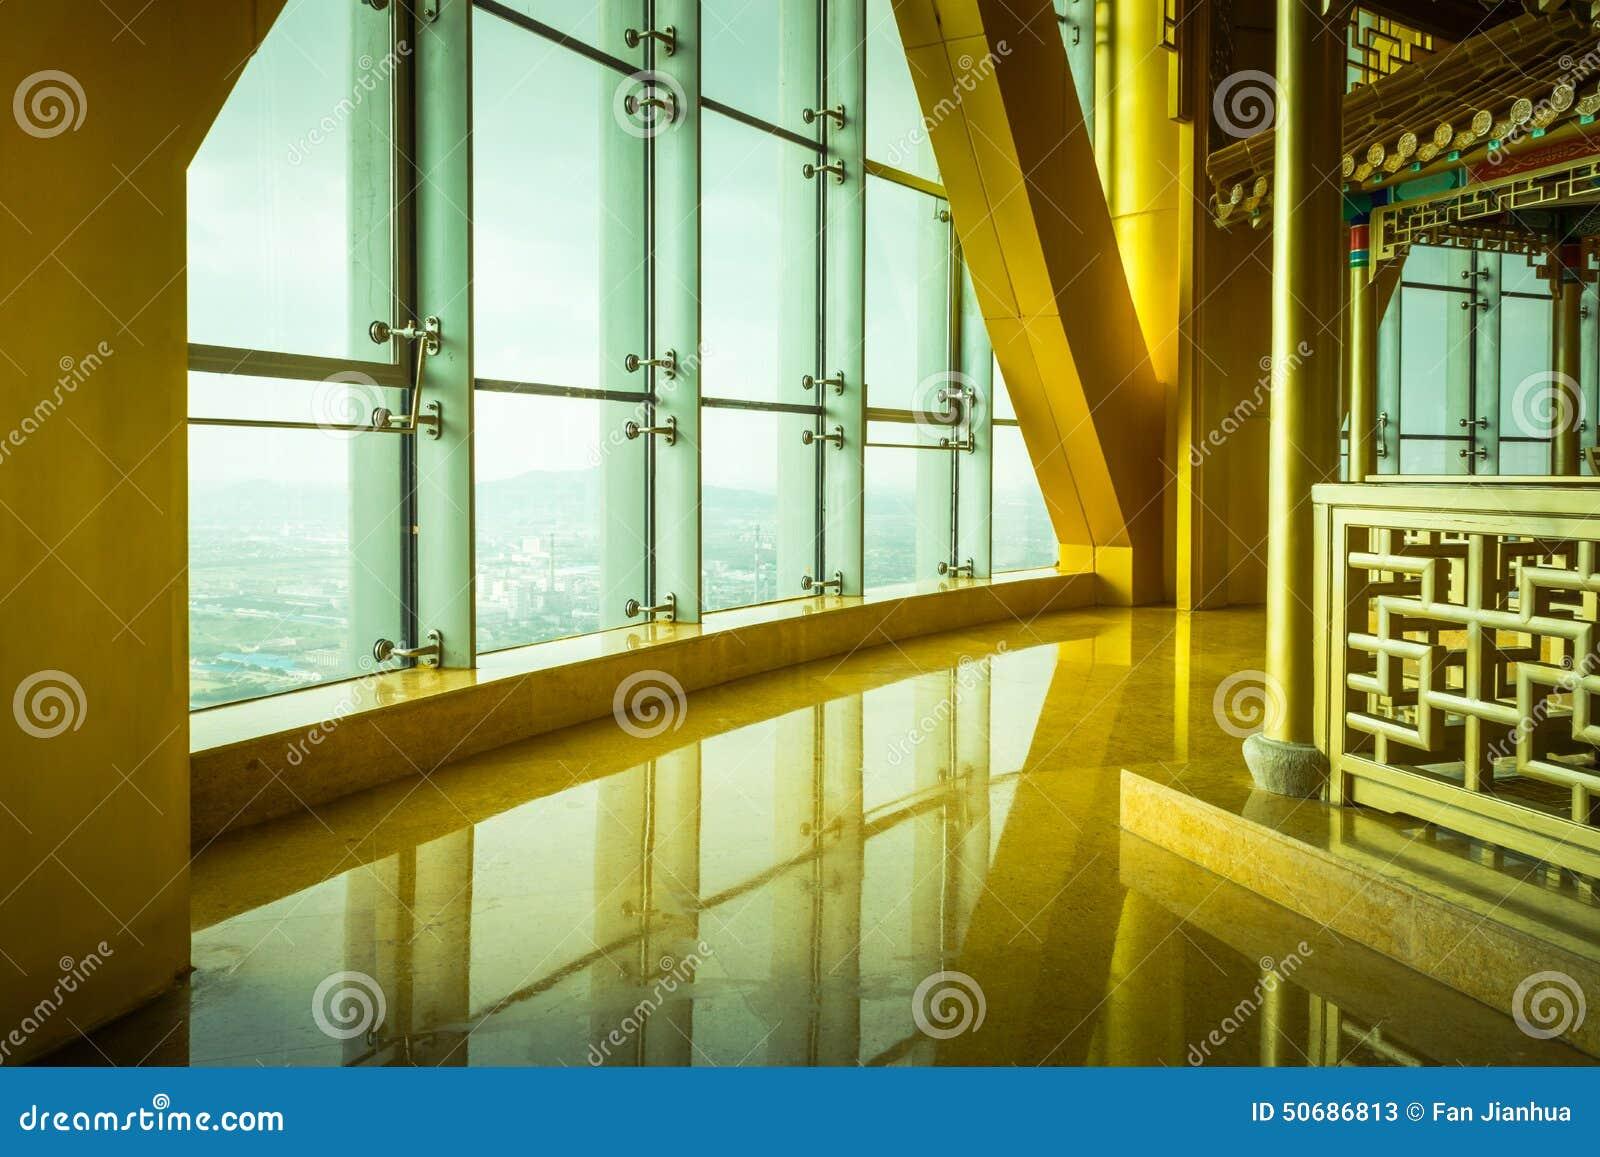 Download 现代大厦的内部结构 库存图片. 图片 包括有 豪华, 的treadled, 平衡, 室内, 来回, 办公室 - 50686813